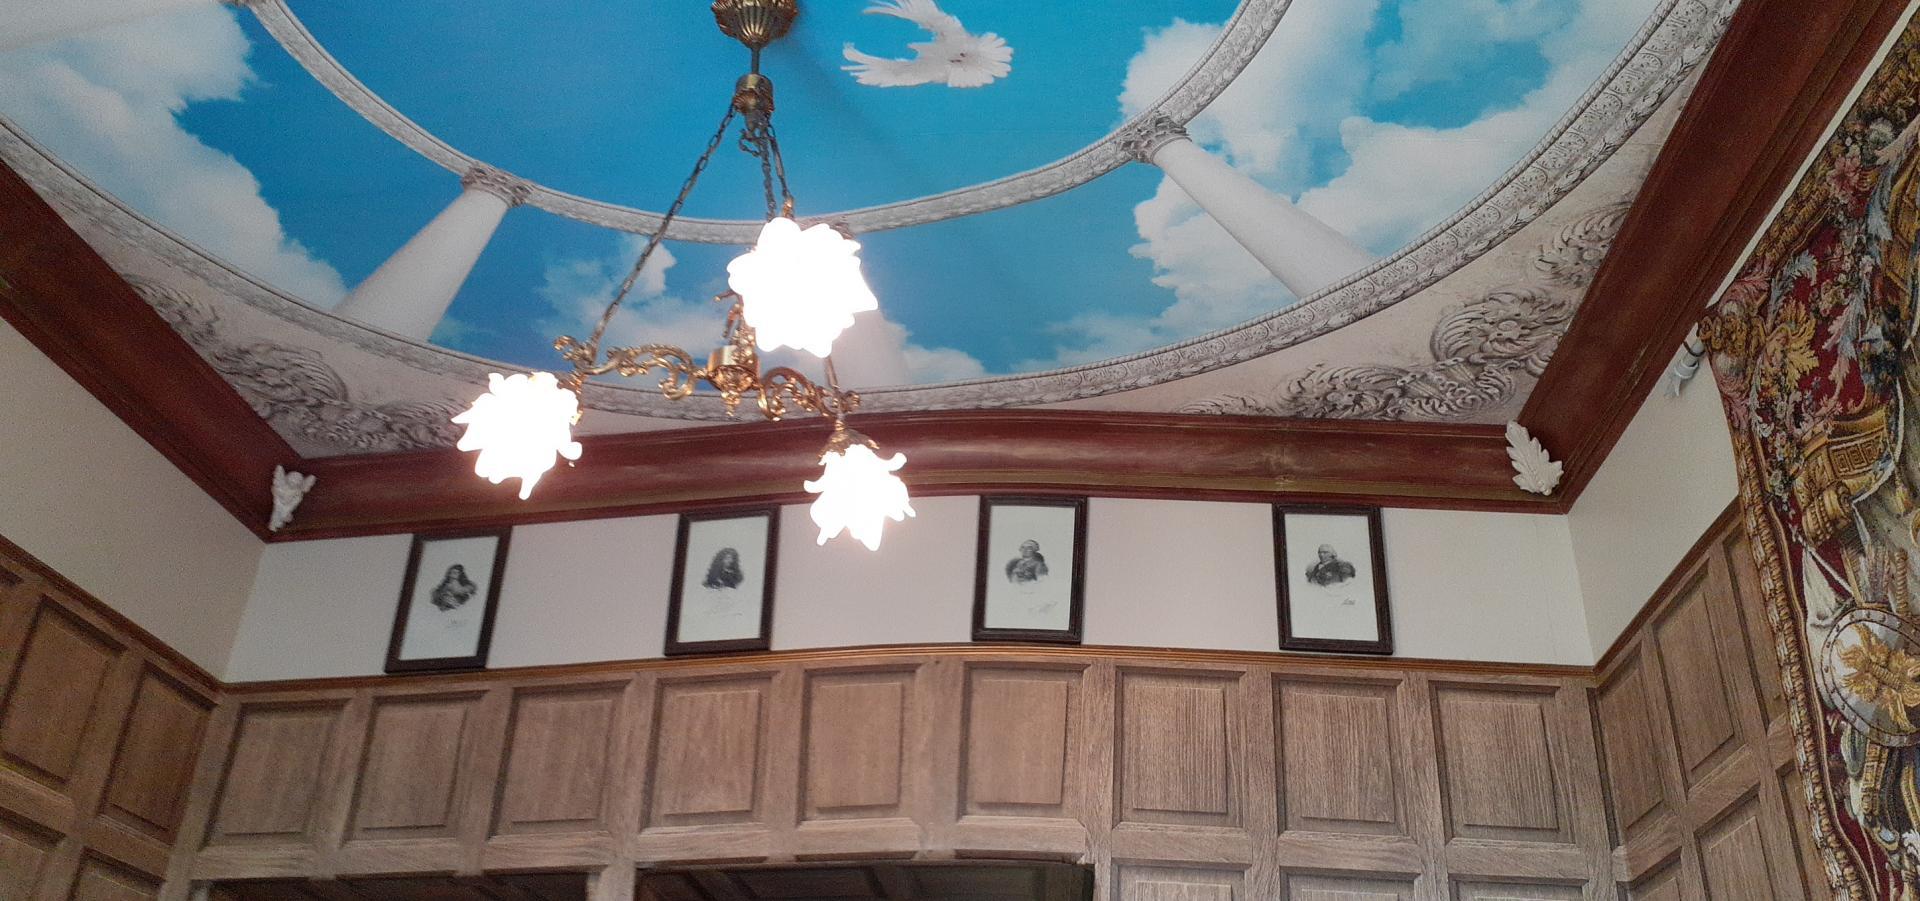 Cabinet travail plafond